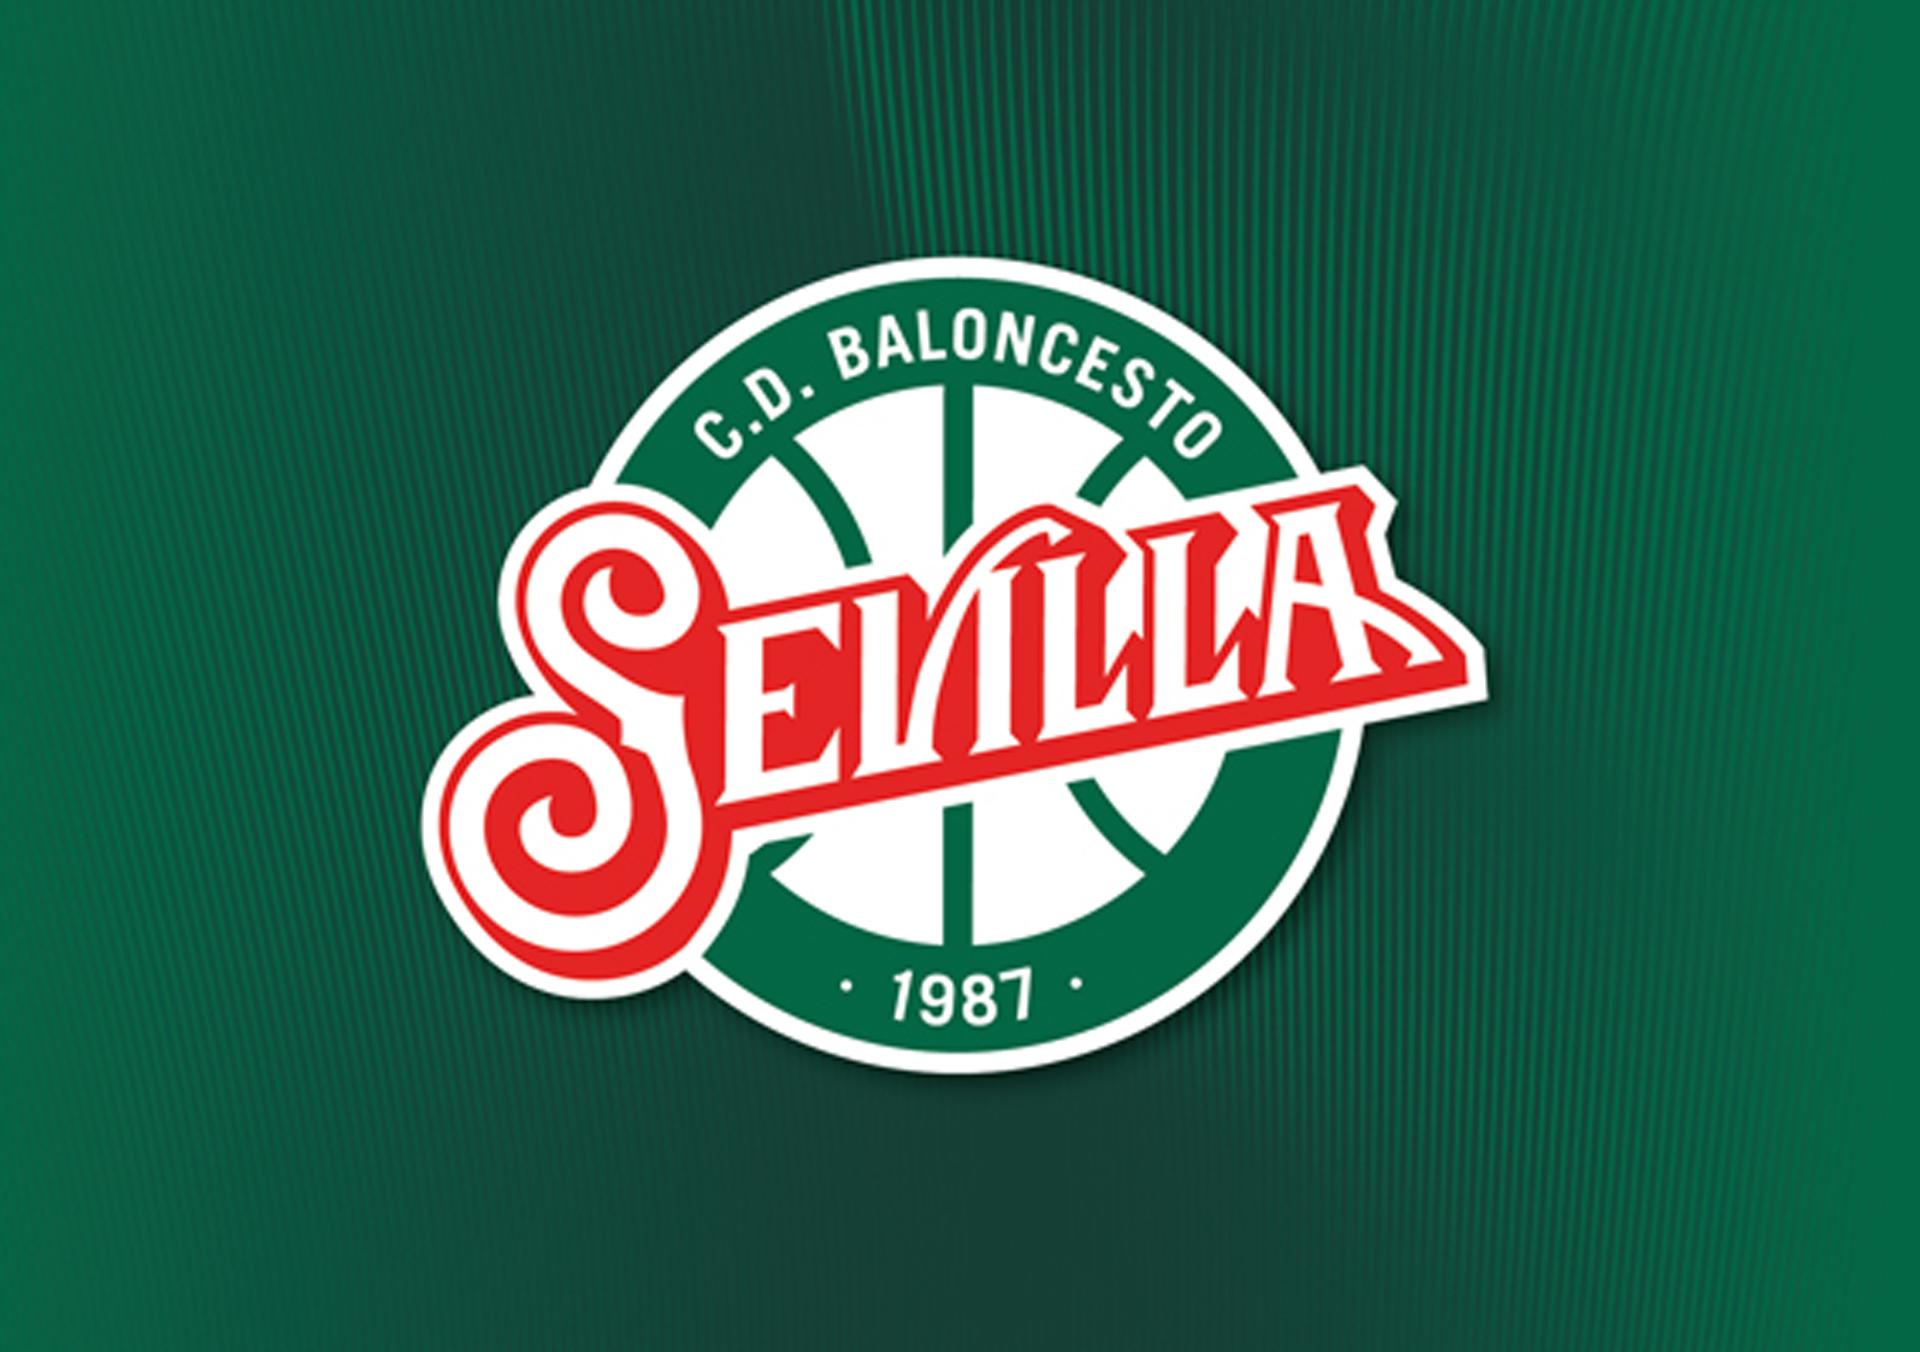 _Miniatura Sevilla Baloncesto Diseño logo nuevo Hotartworks Hota Abenza